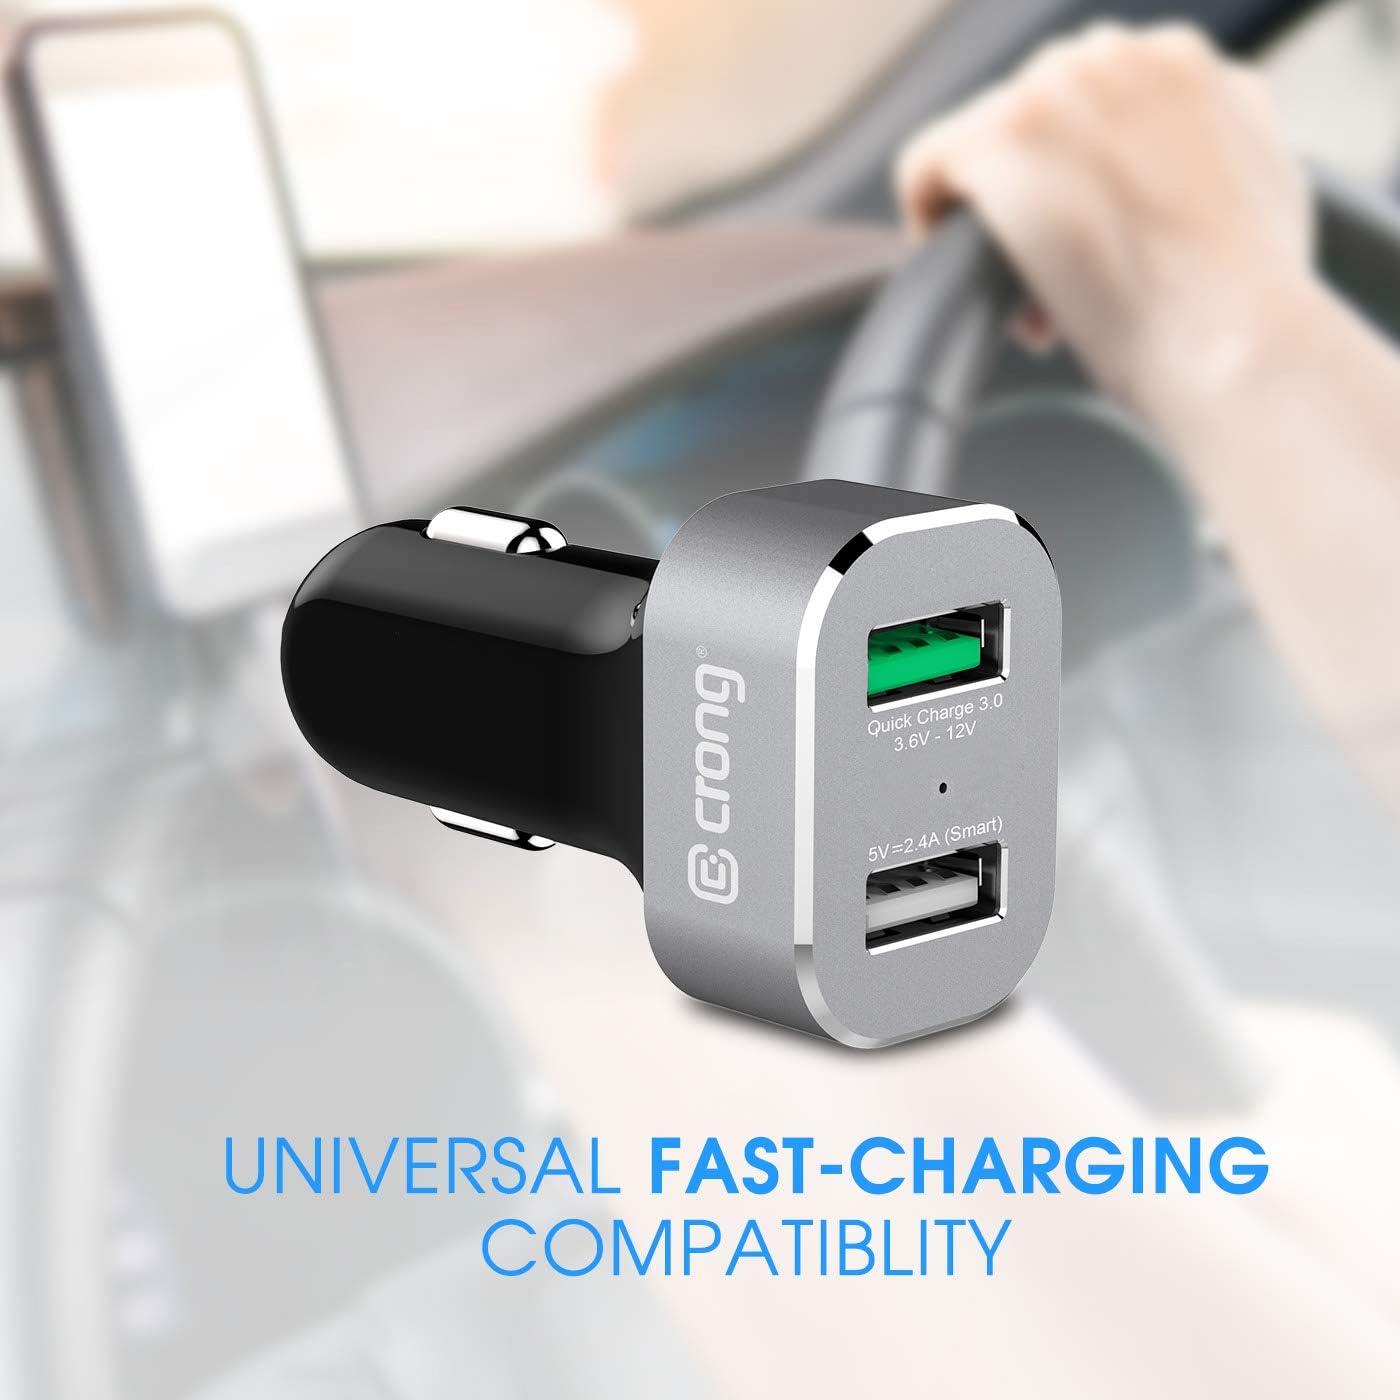 Crong Power Car Charger 63W Autoladeger/ät USB-C PD 45W aluminium//schwarz USB 18W QuickCharge 3.0